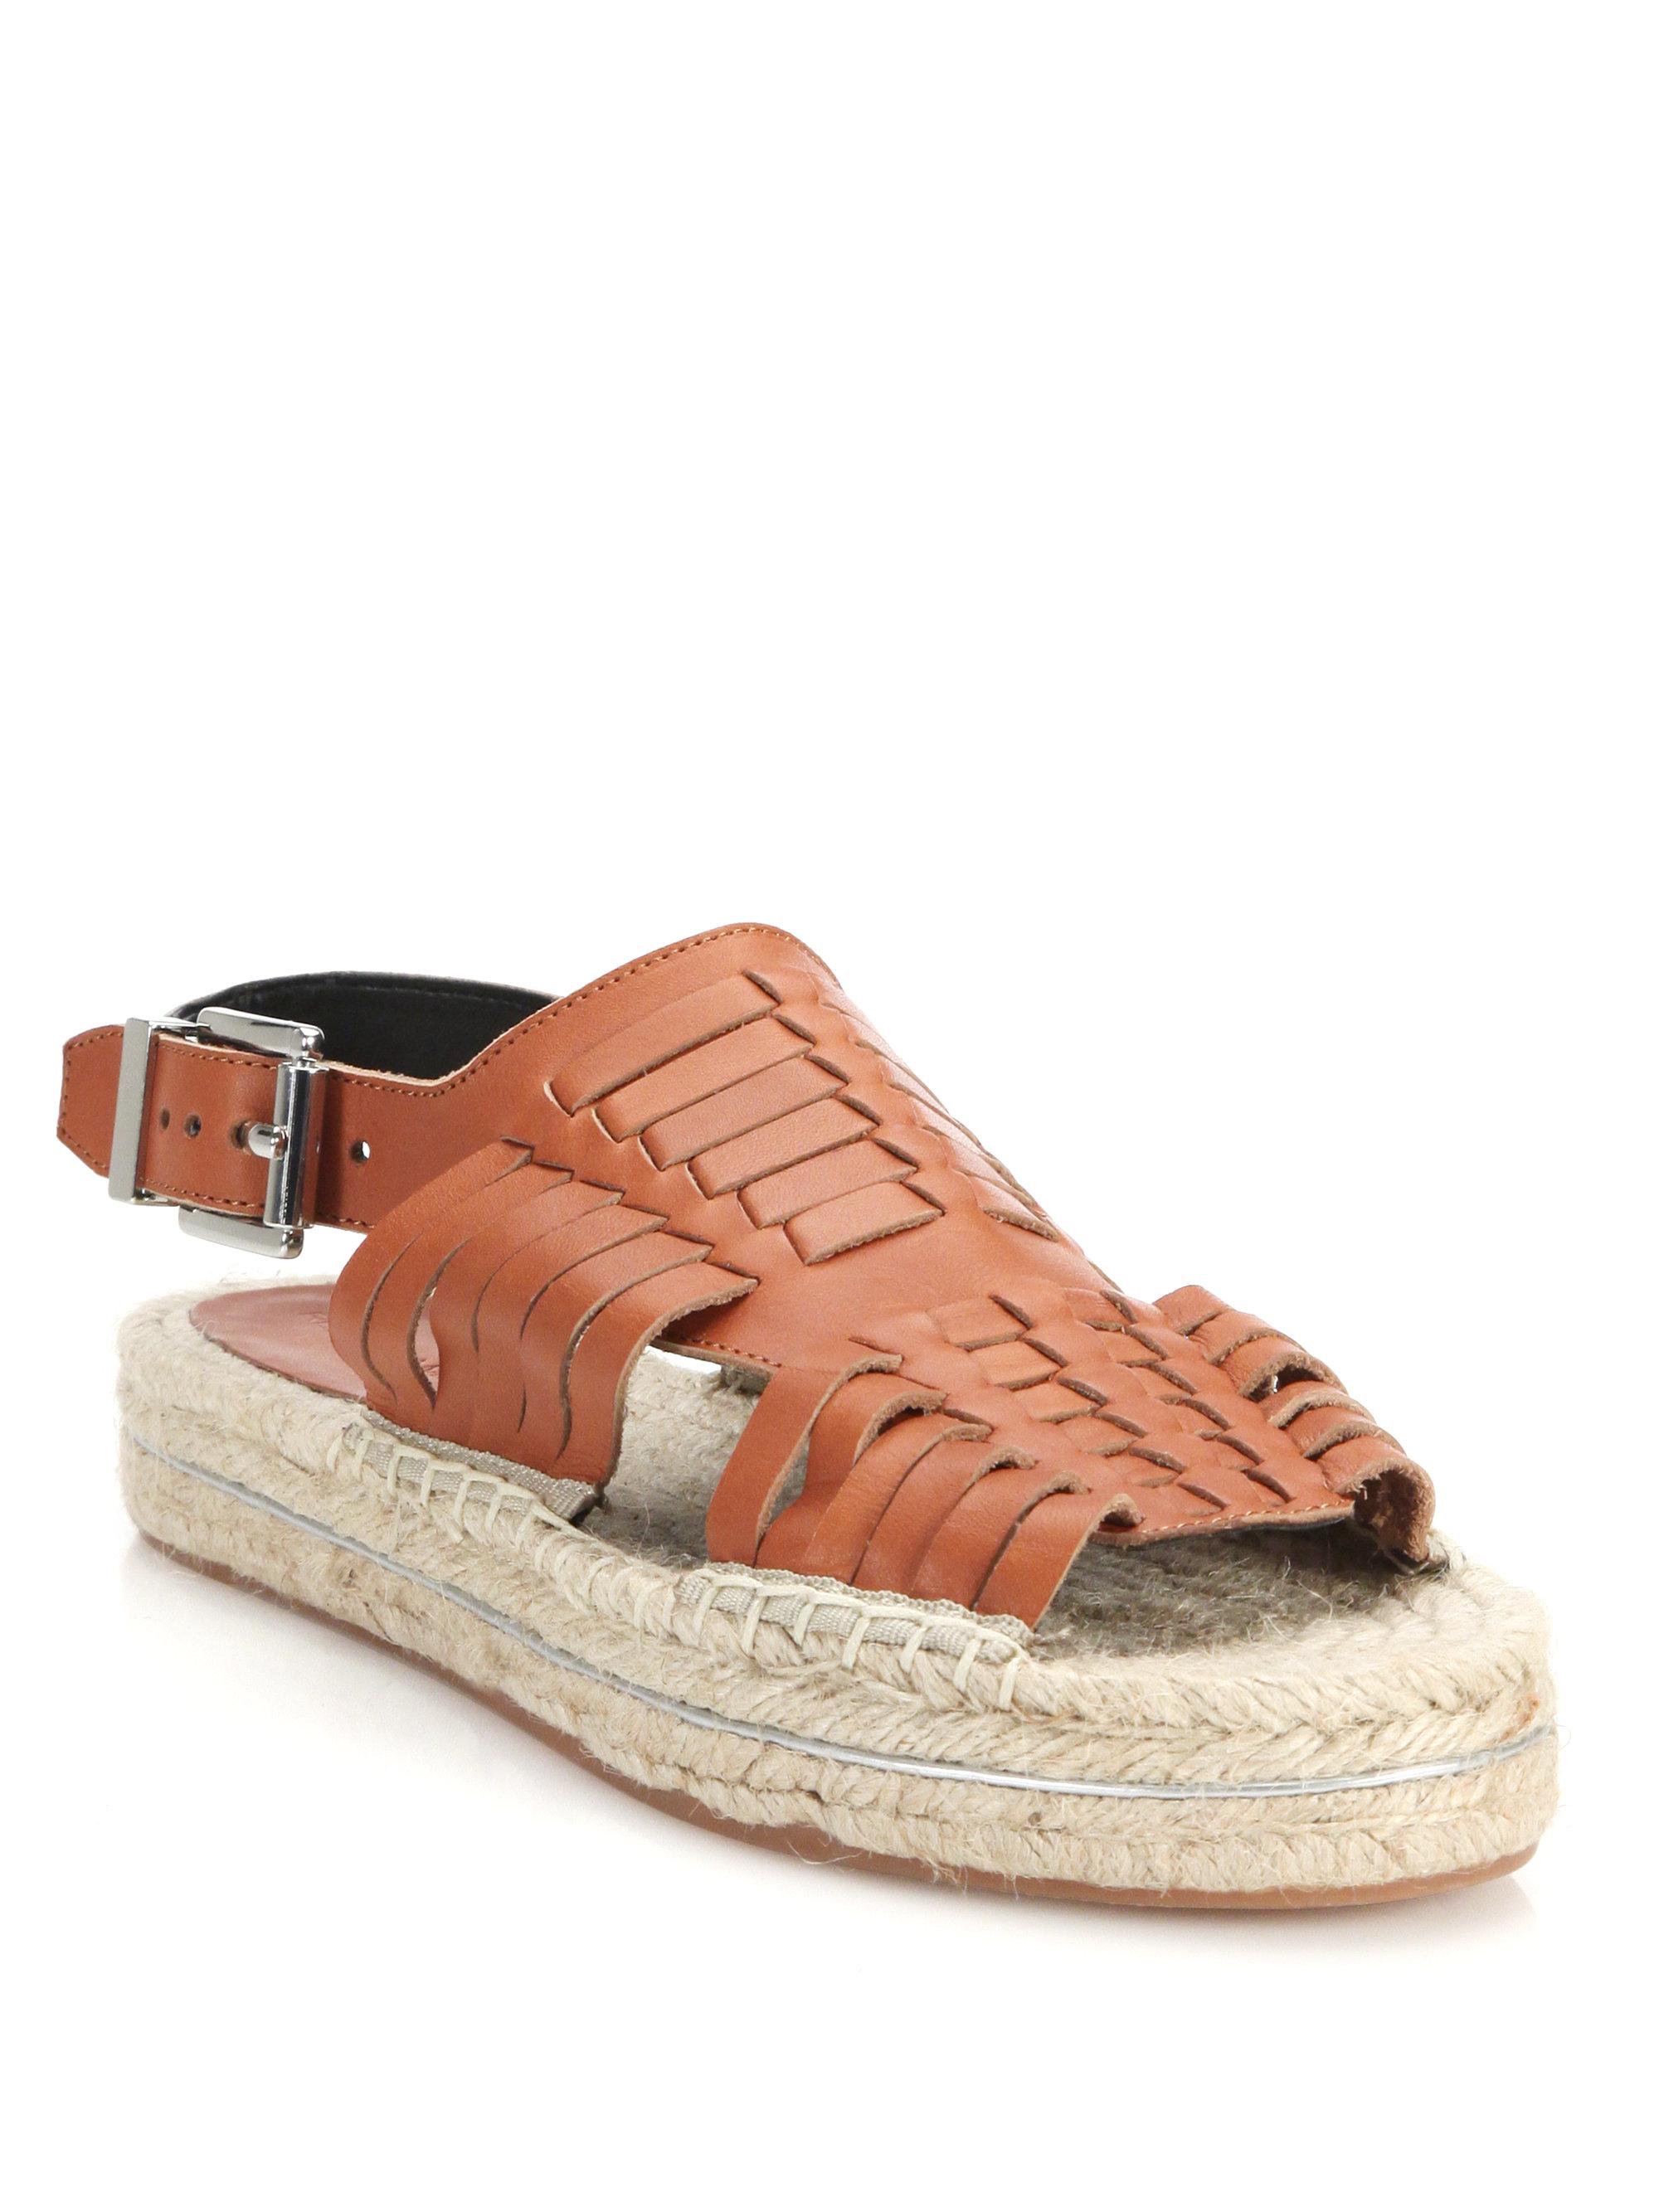 9fe0330511df Lyst - Rebecca Minkoff Gabriel Huarache Leather Espadrille Sandals ...